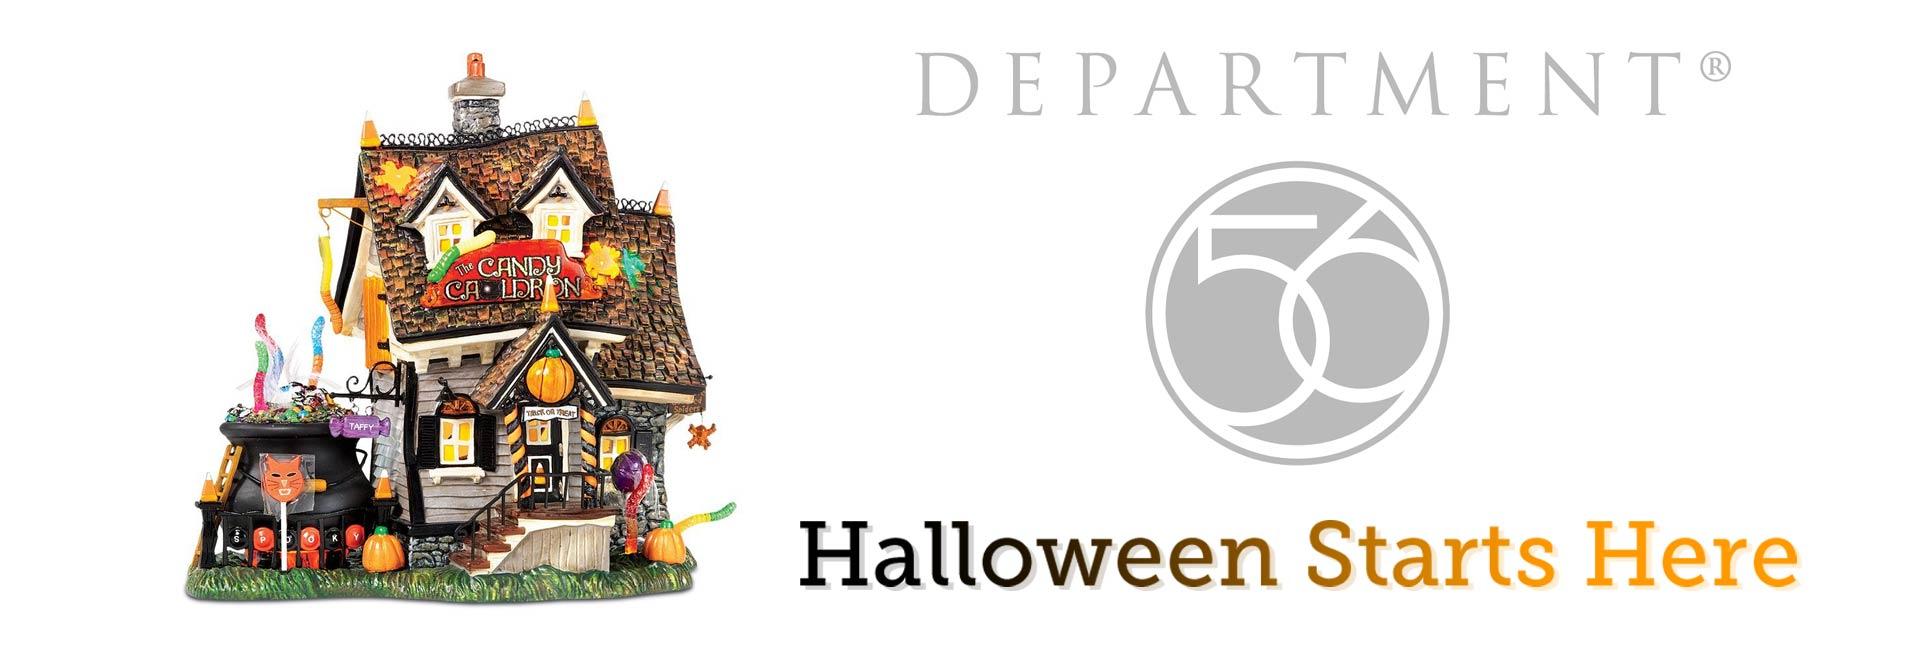 halloween decor halloween decorations halloween decorations